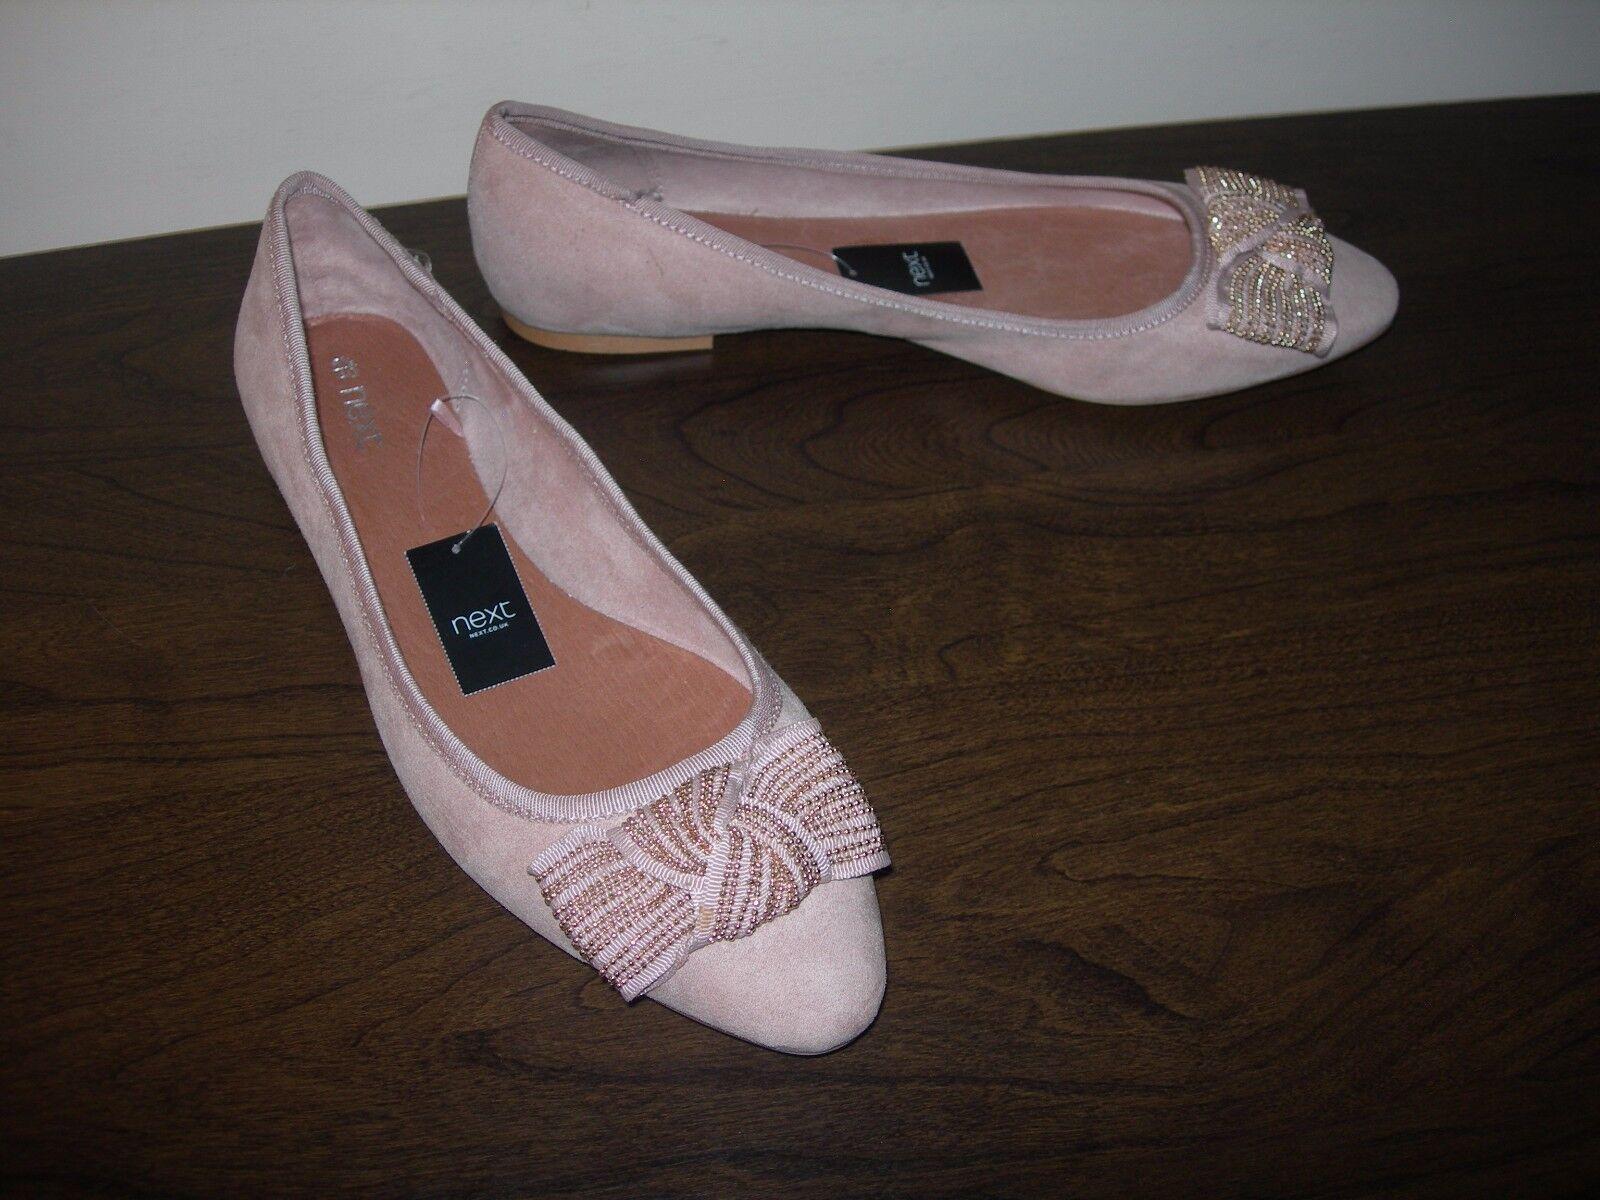 NEXT Femme Slip On Chaussures Ballet Pumps synthétique Dessus En Daim EU 40 UK 6.5